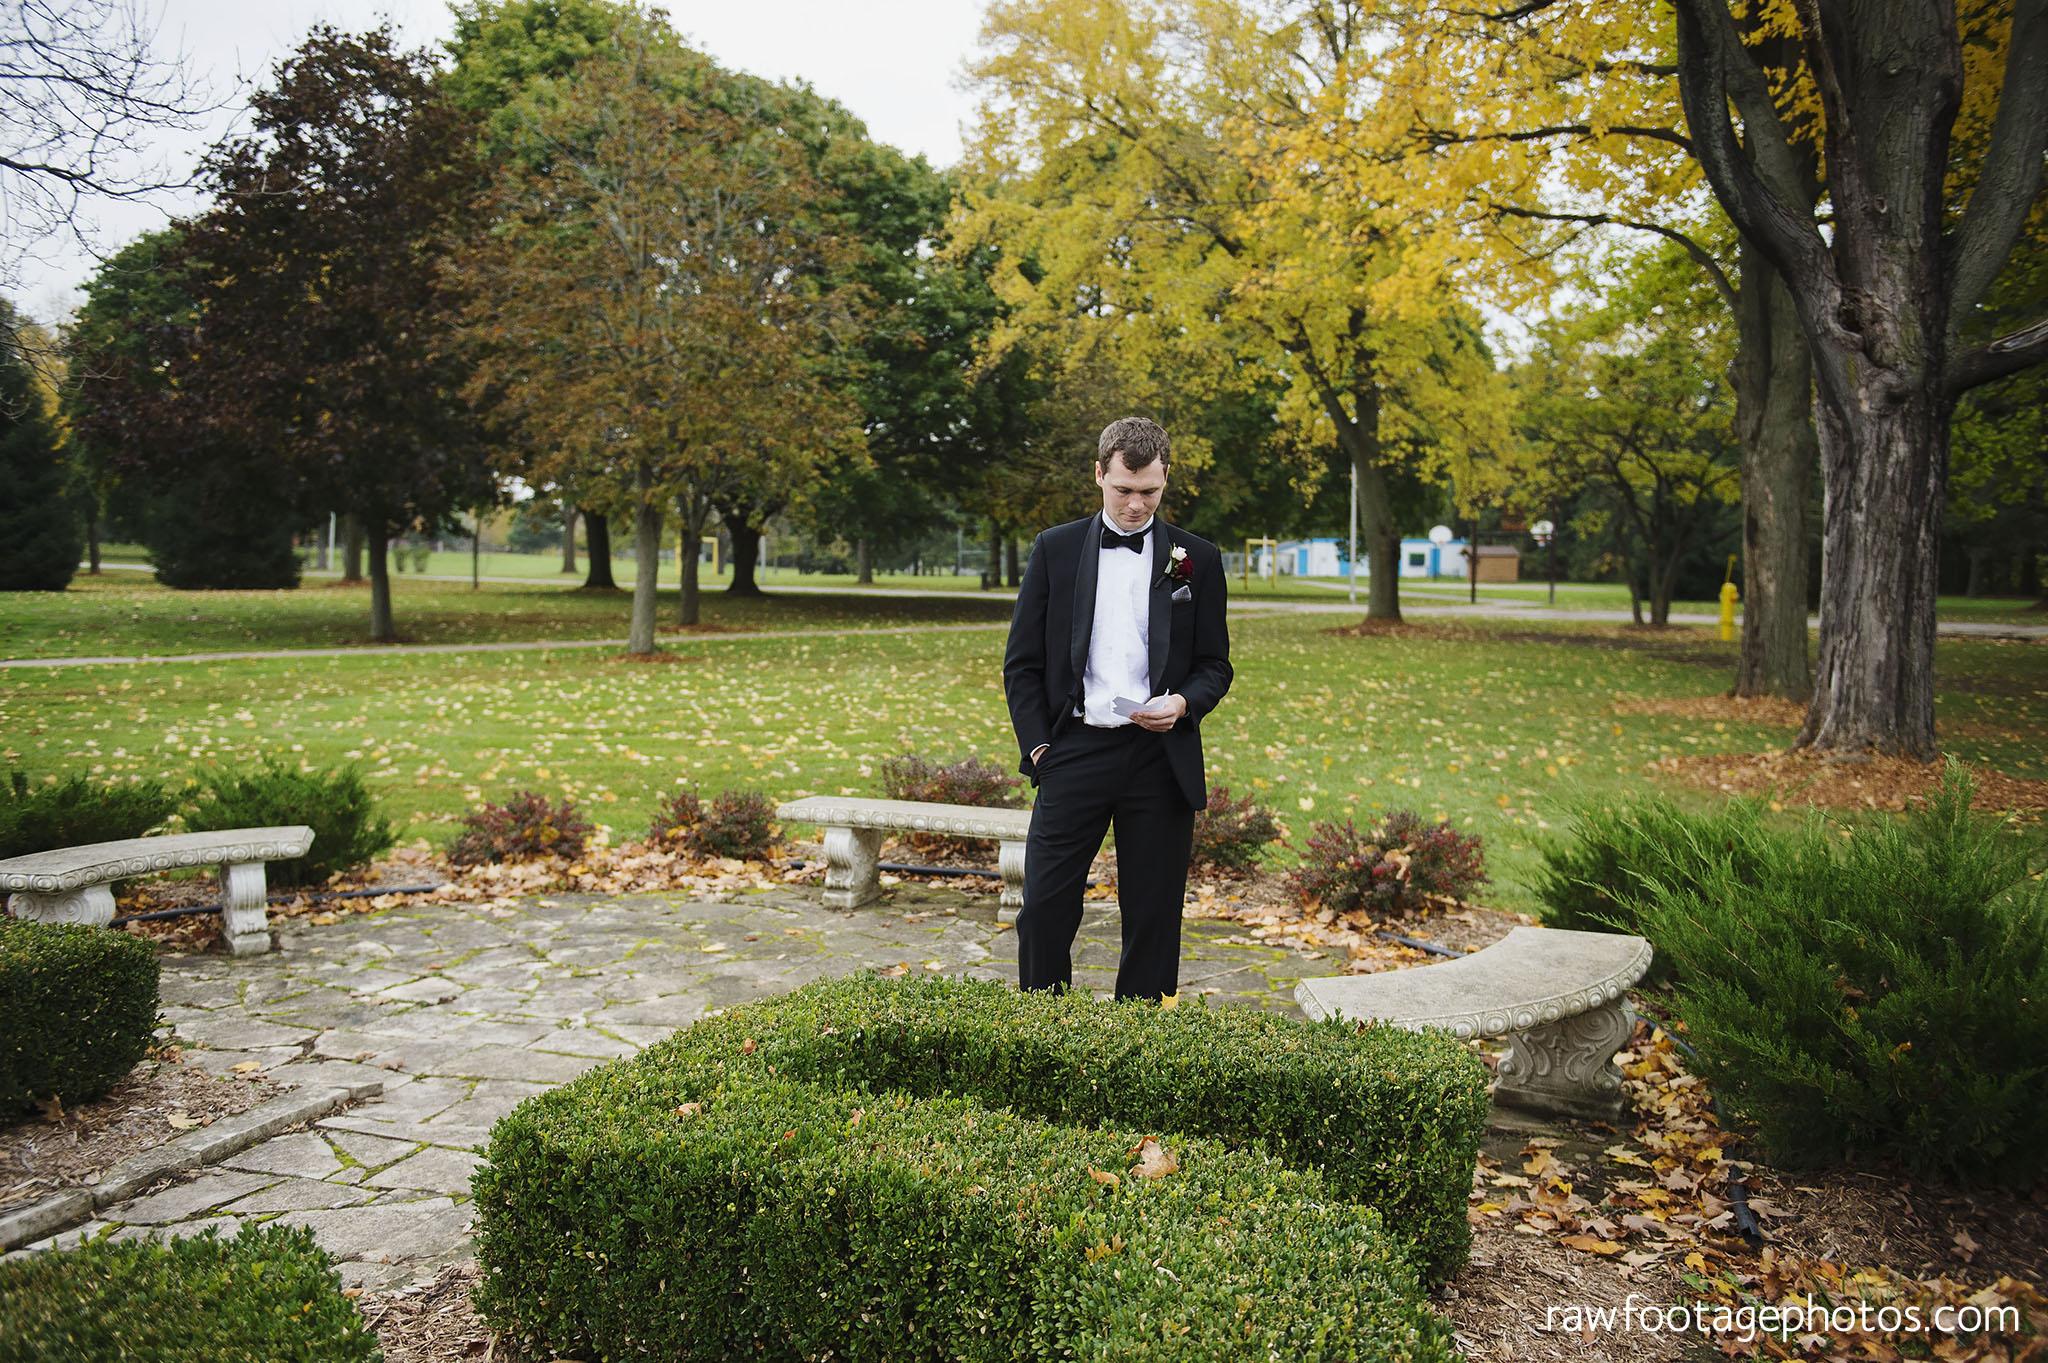 london_ontario_wedding_photos-fall_wedding_photography-raw_footage_photography-elm_hurst_inn_wedding015.jpg